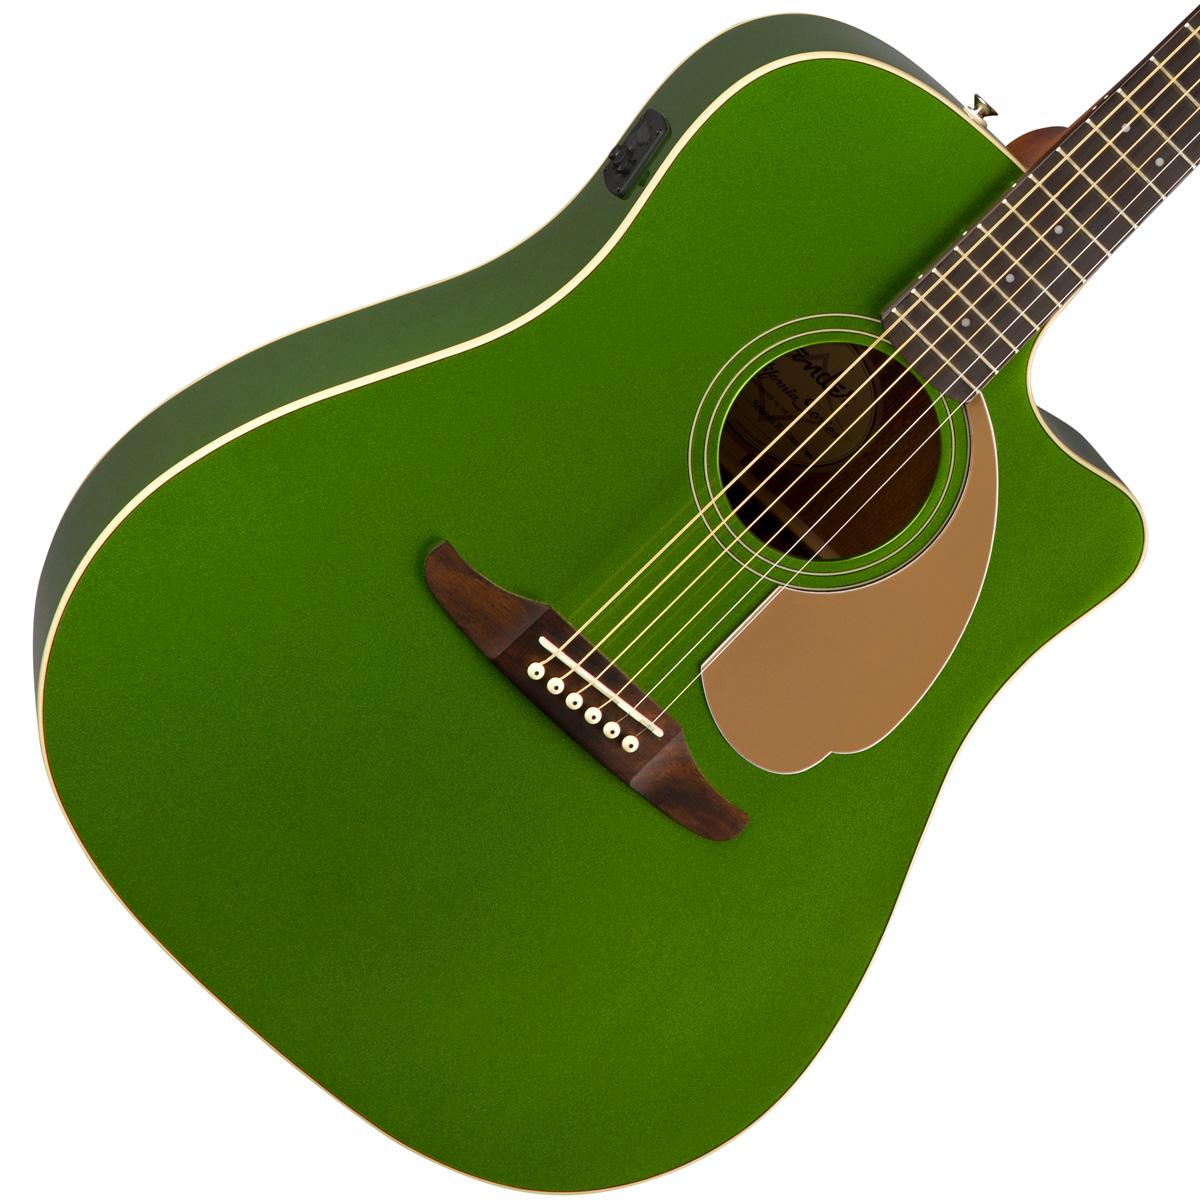 FENDER / REDONDO PLAYER ELECTRIC JADE (ELJ) 【CALIFORNIA SERIES】フェンダー アコースティックギター